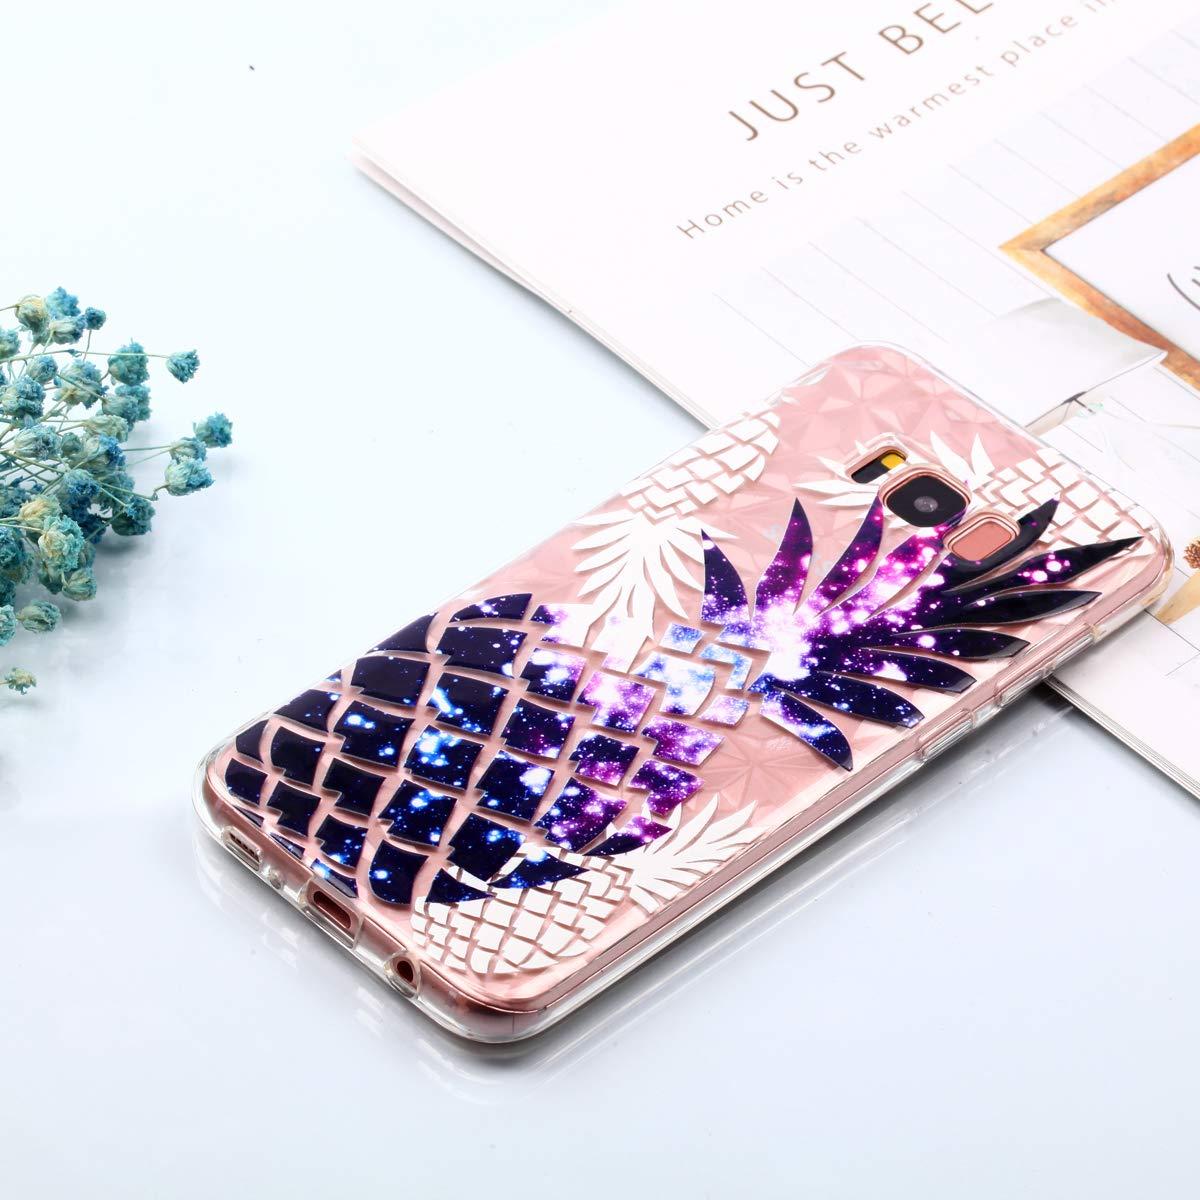 Felfy Kompatibel mit Galaxy S8 H/ülle Silikon Transparent mit Ananas Muster Crystal Clear Ultra D/ünn Flexibel Silikon Durchsichtig Case Kratzfeste Protective Handytasche